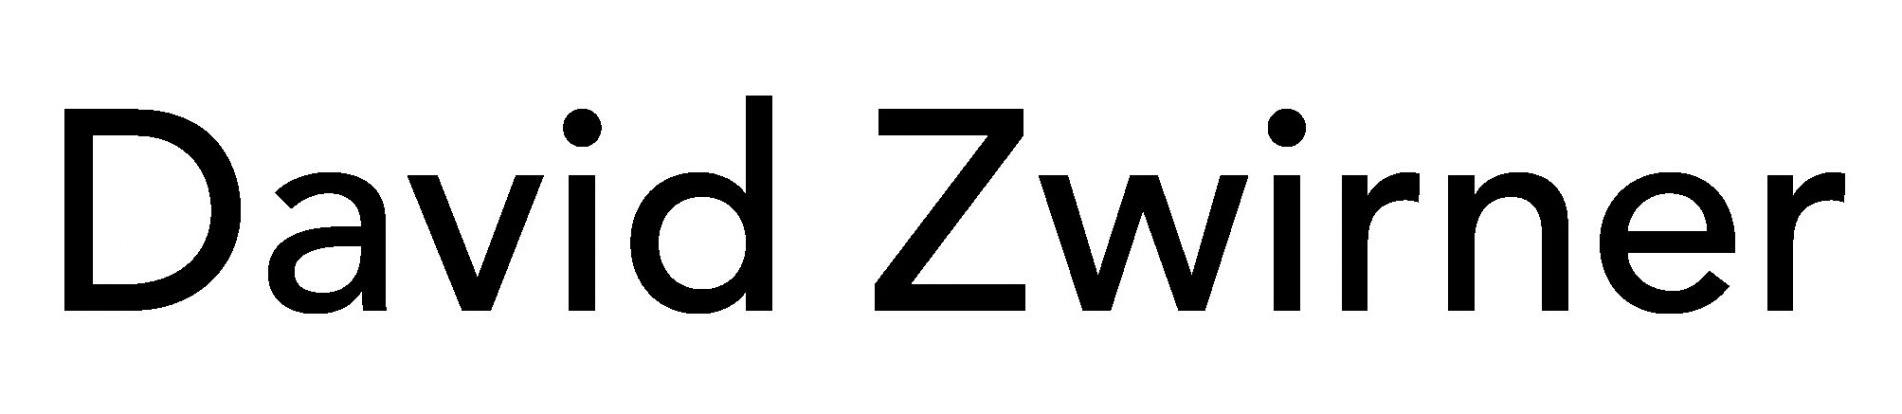 David Zwirner logo.png